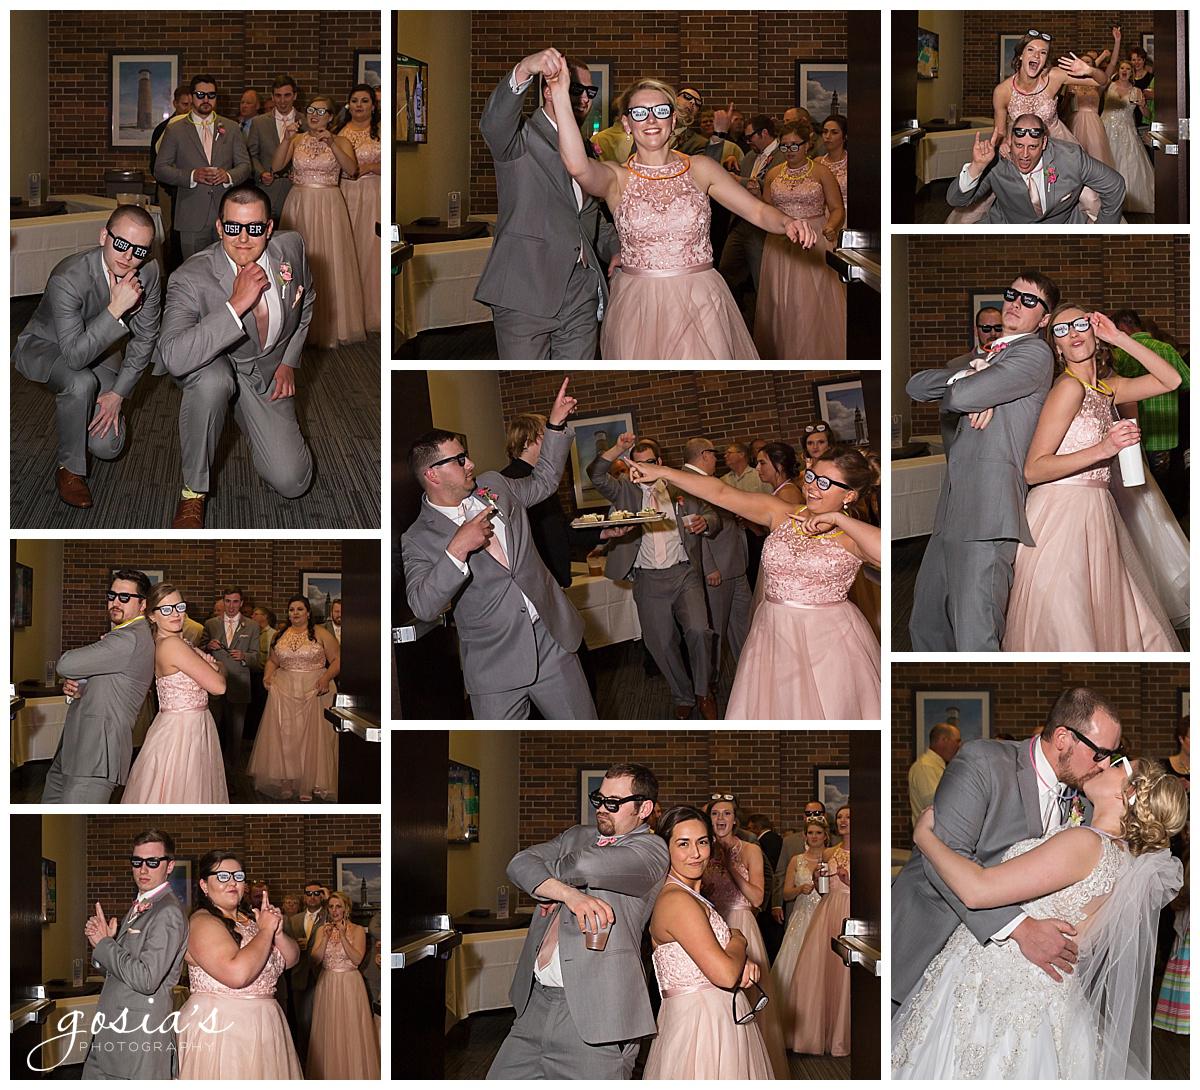 Gosias-Photography-Appleton-wedding-photographer-Fond-du-Lac-ceremony-Holiday-Inn-reception-Shelby-Ryan-_0033.jpg